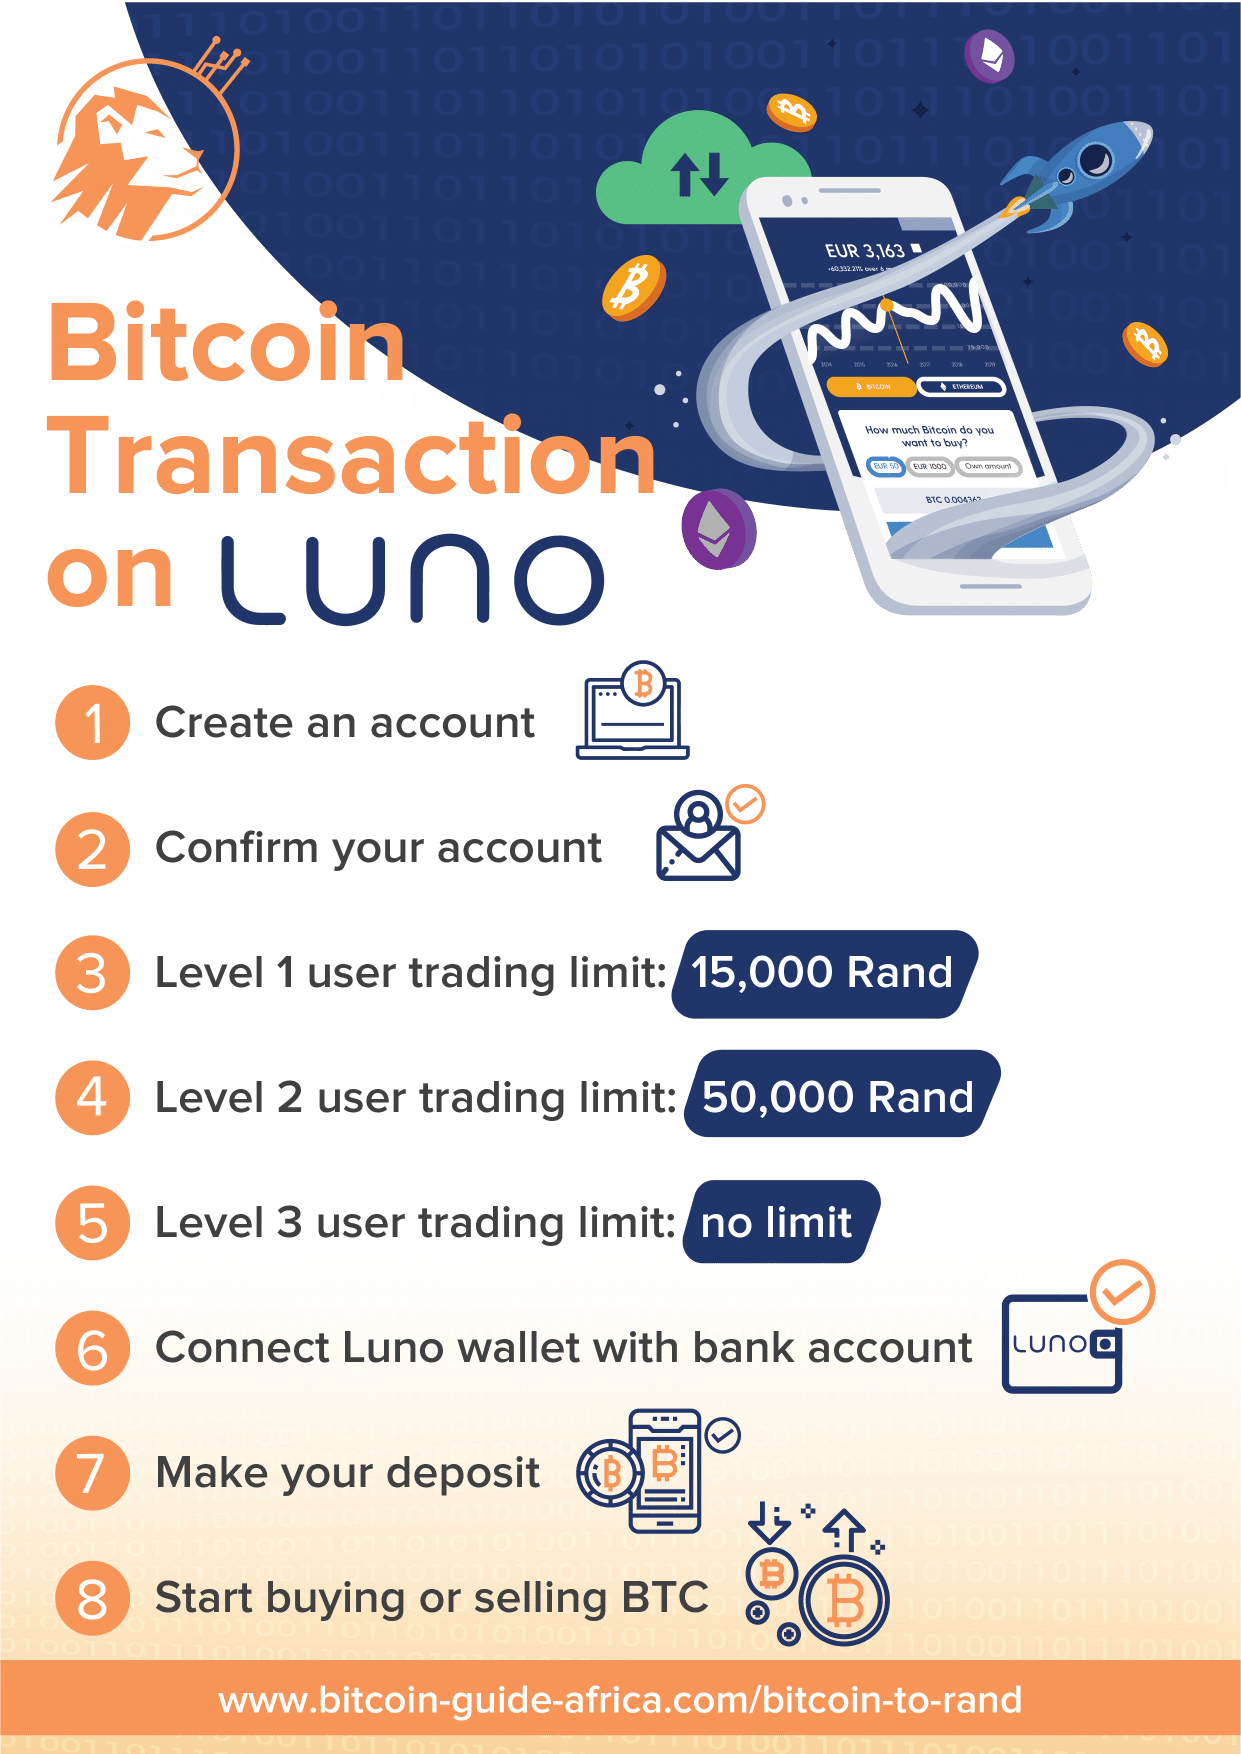 Bitcoin transactions on Luno